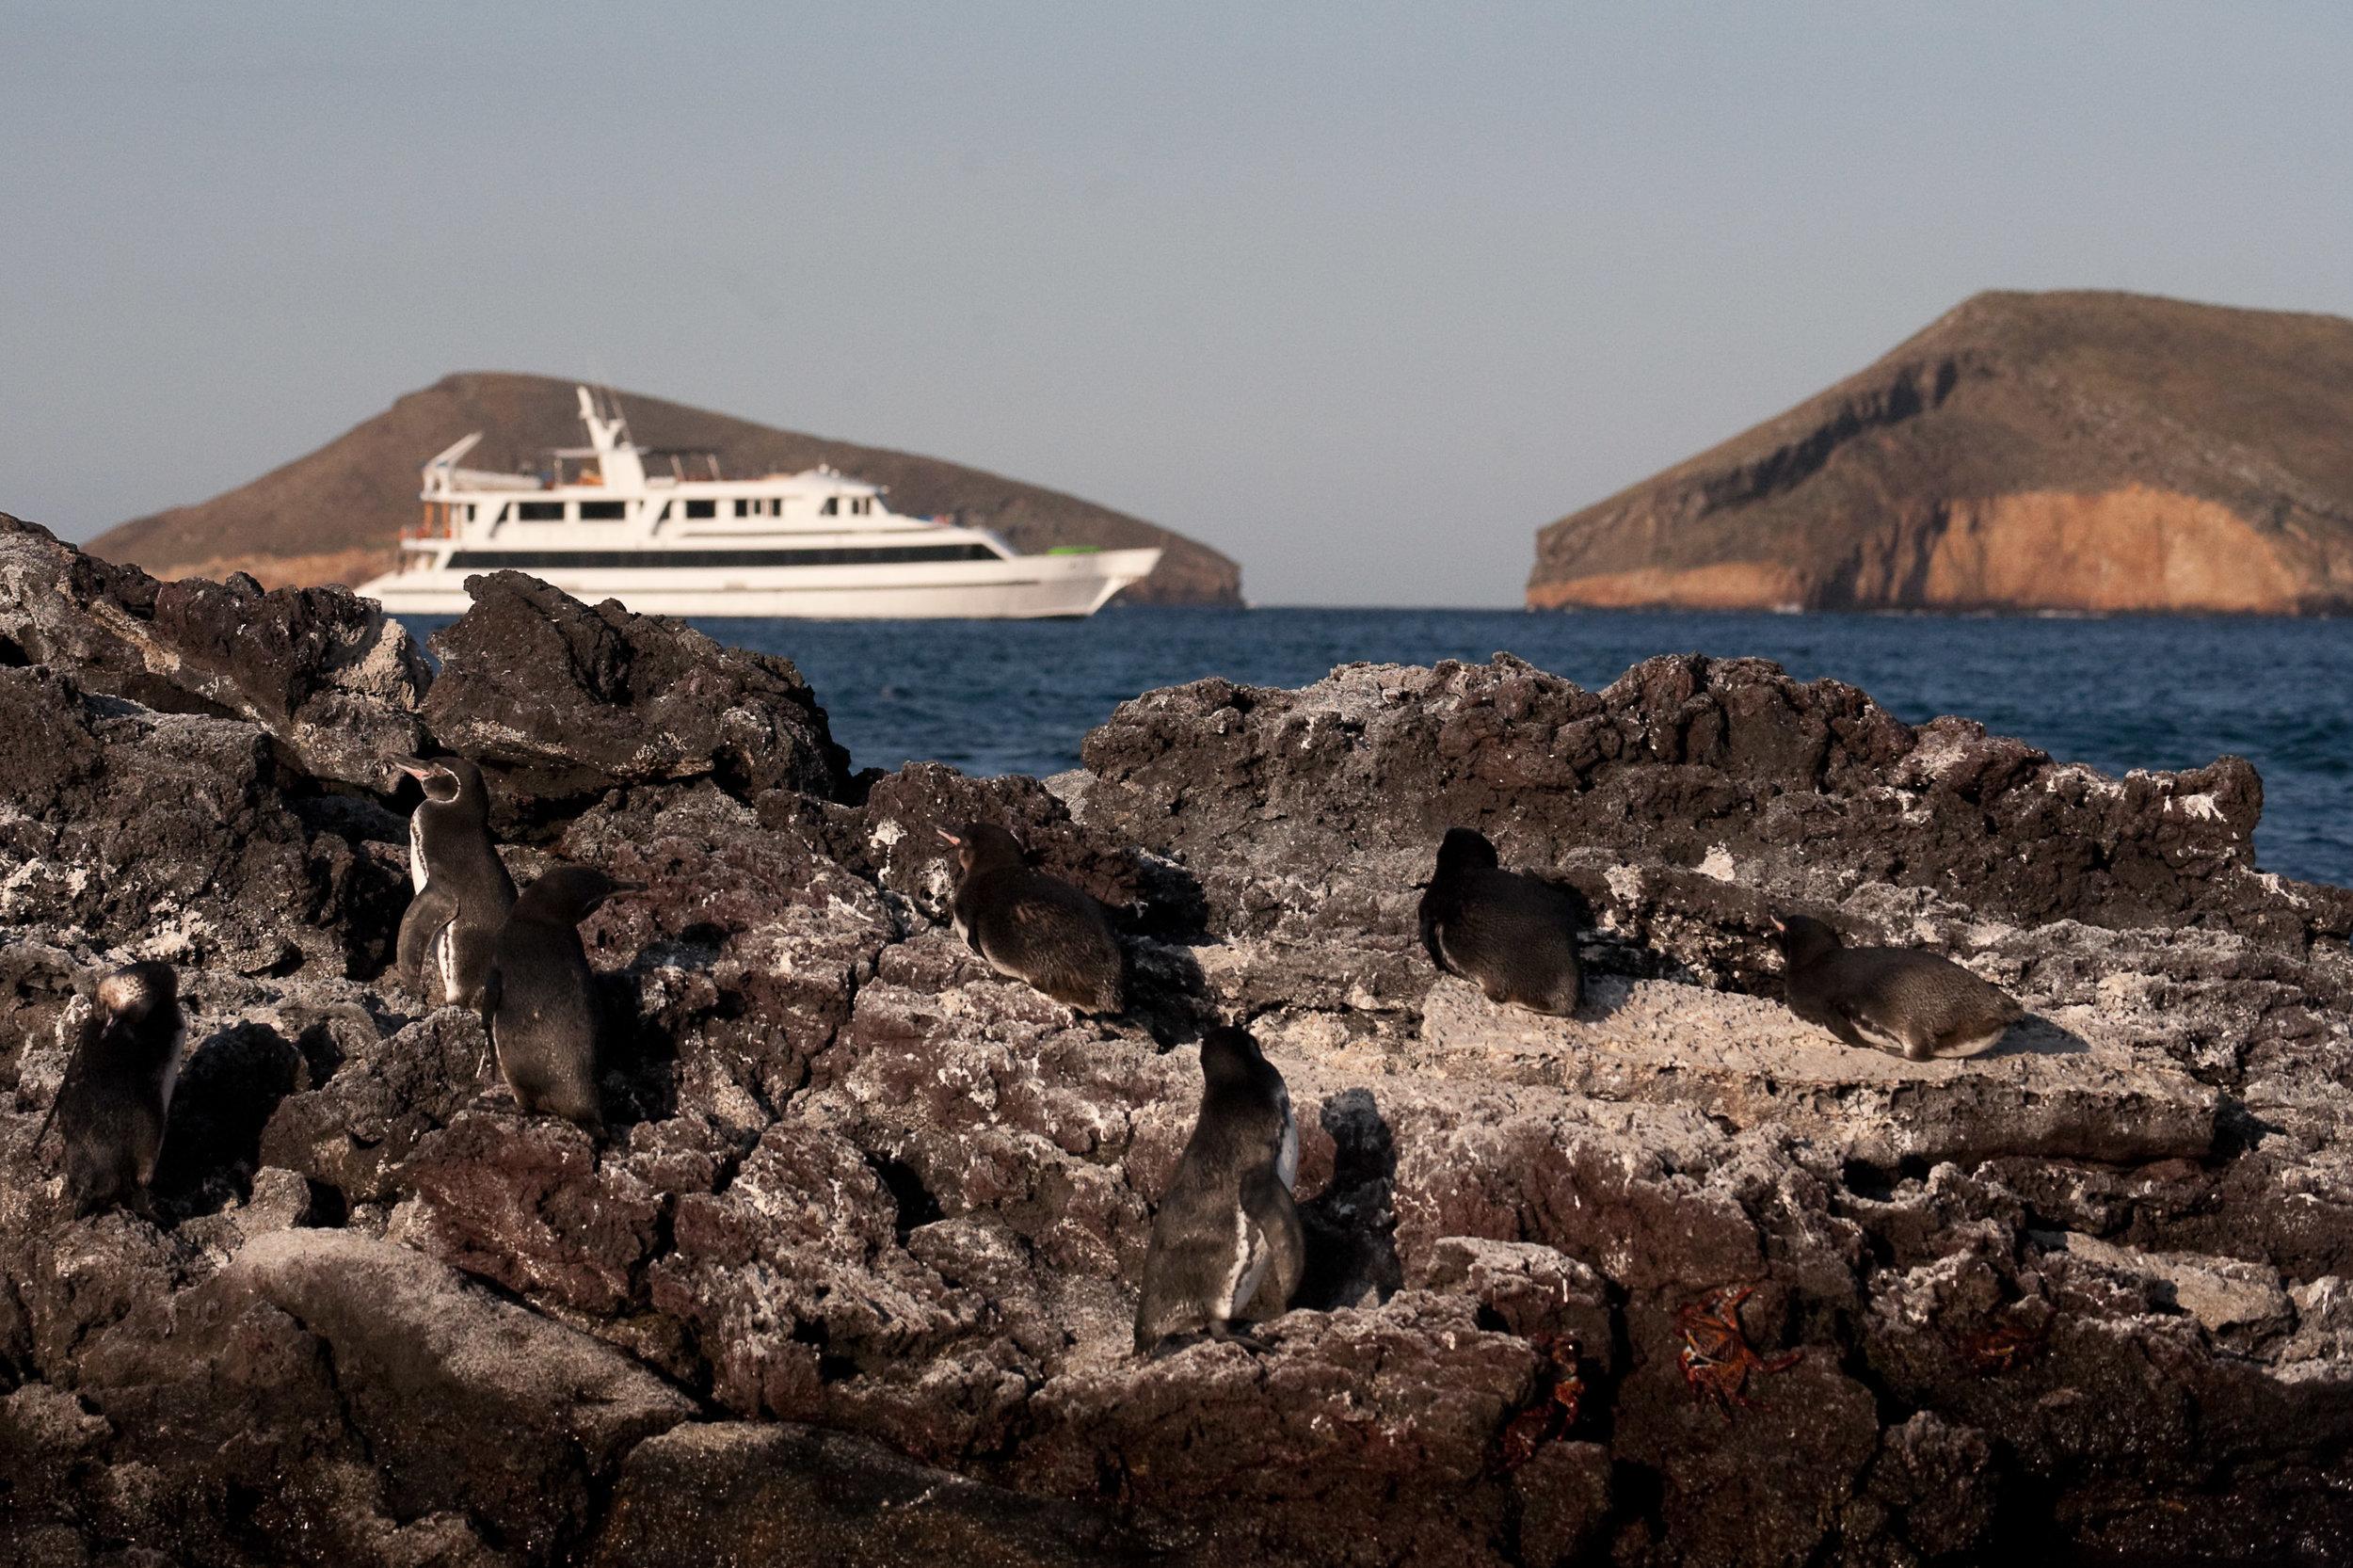 Penguins of Sombrero Chino